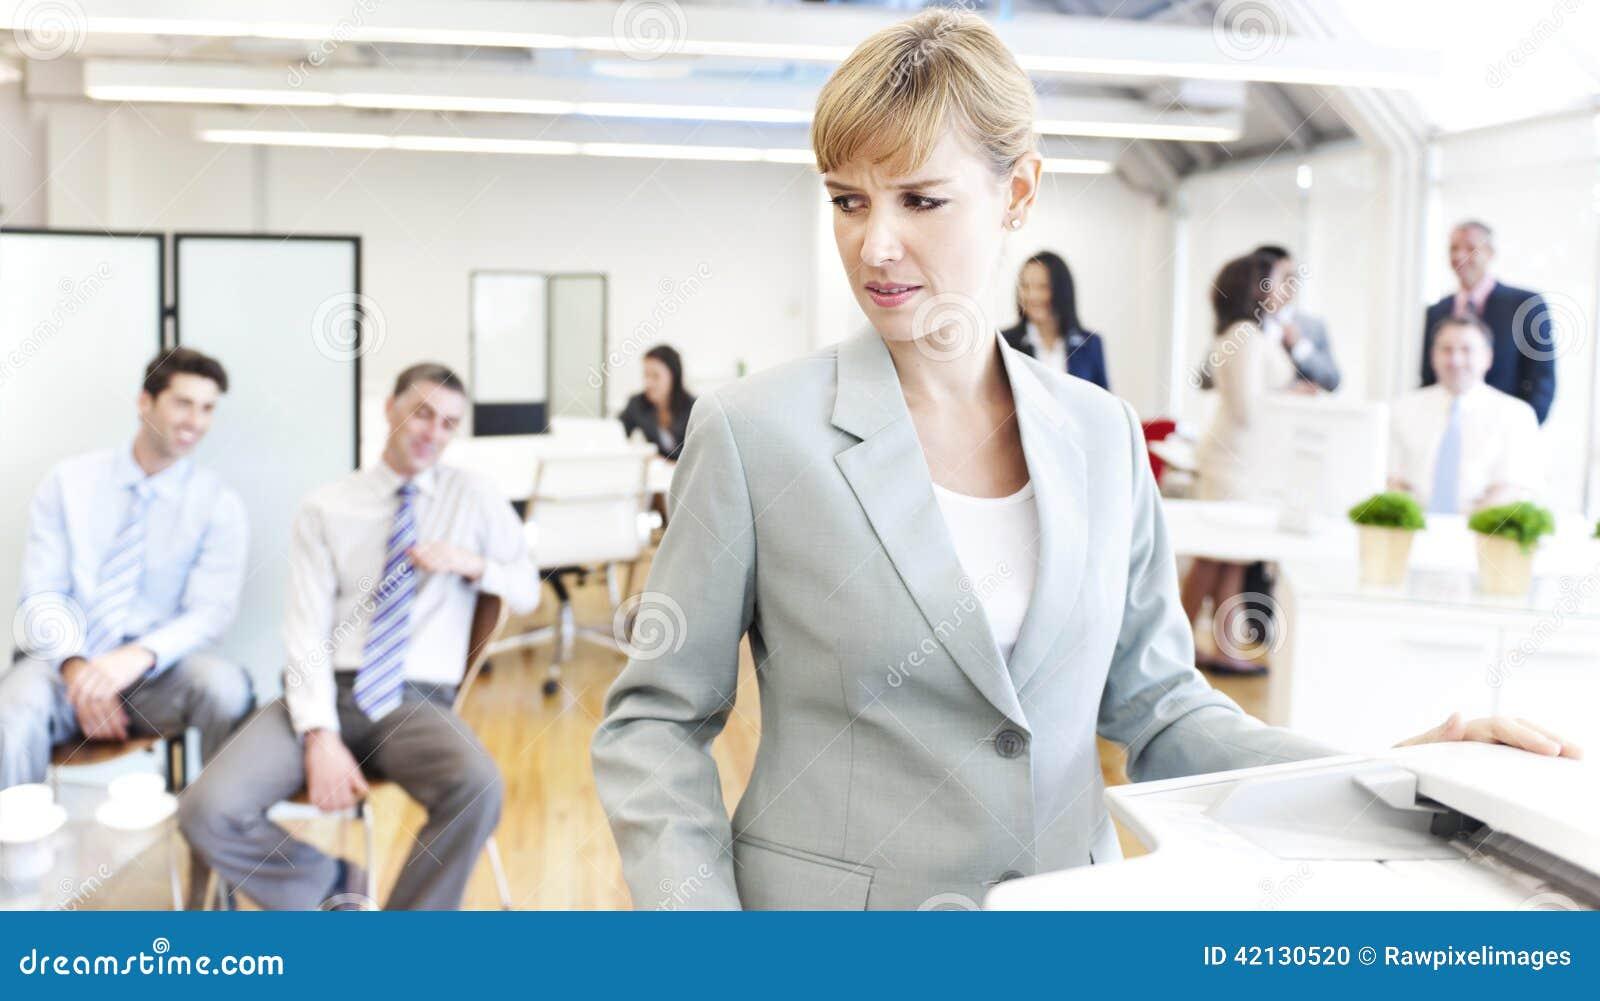 Business people getting bad mood